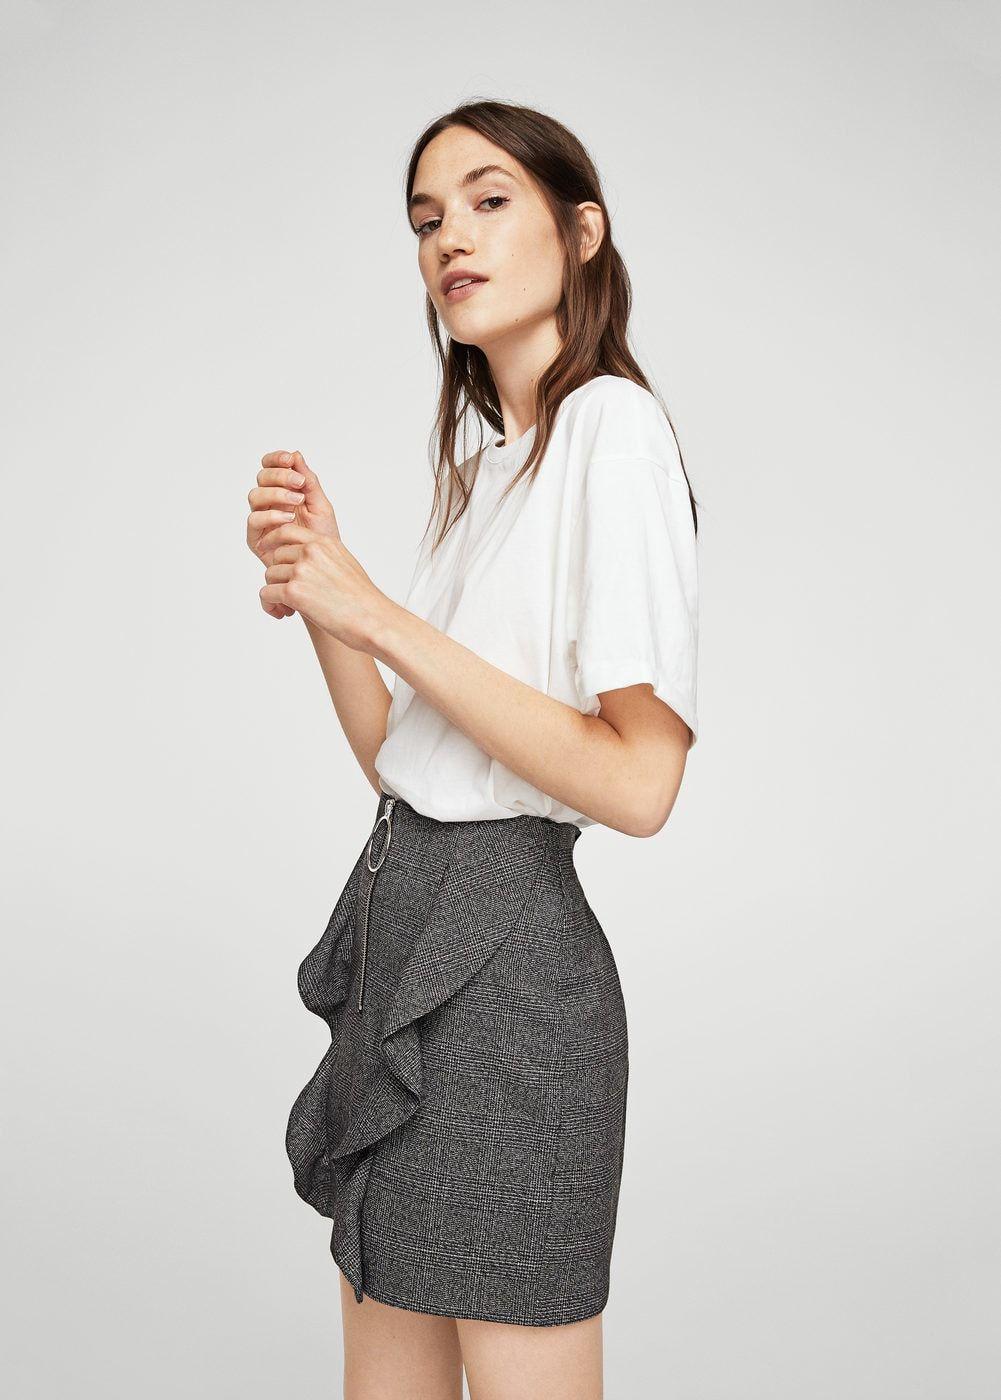 Falda Volantes Mujer Ruffle Cuadros Pinterest Moda Skirt gqp8qx7r1w